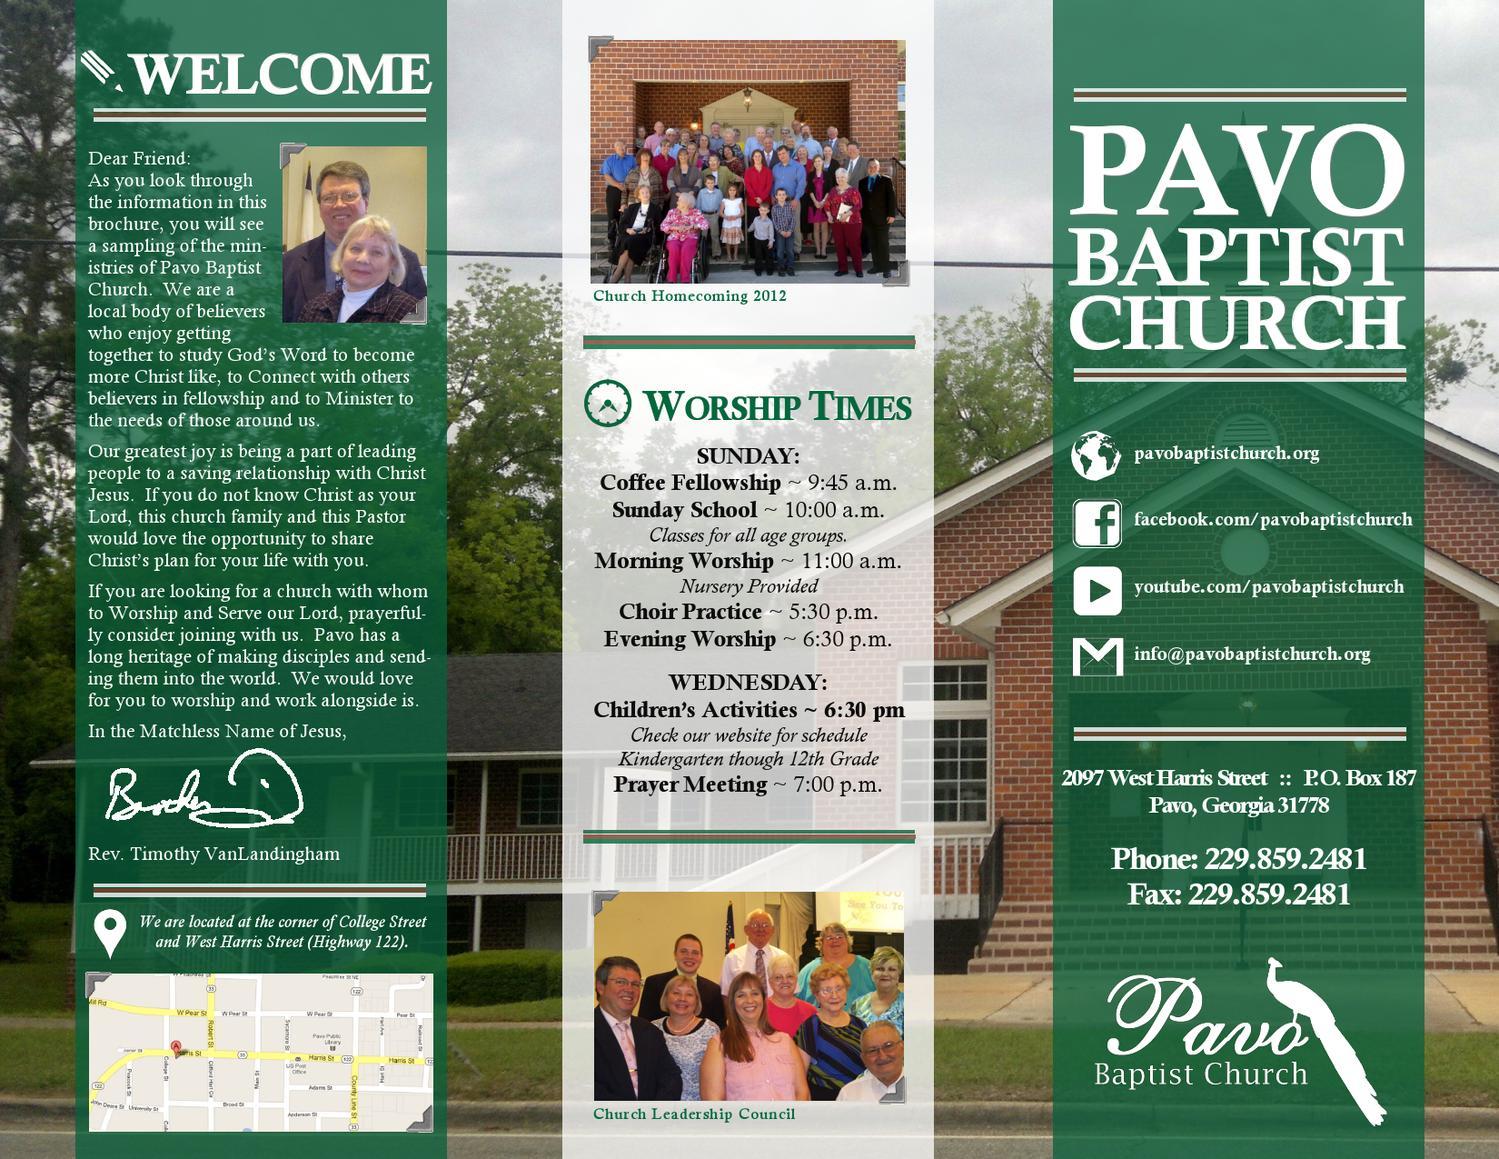 Pavo baptist church brochure 2013 by pavo baptist church issuu thecheapjerseys Gallery